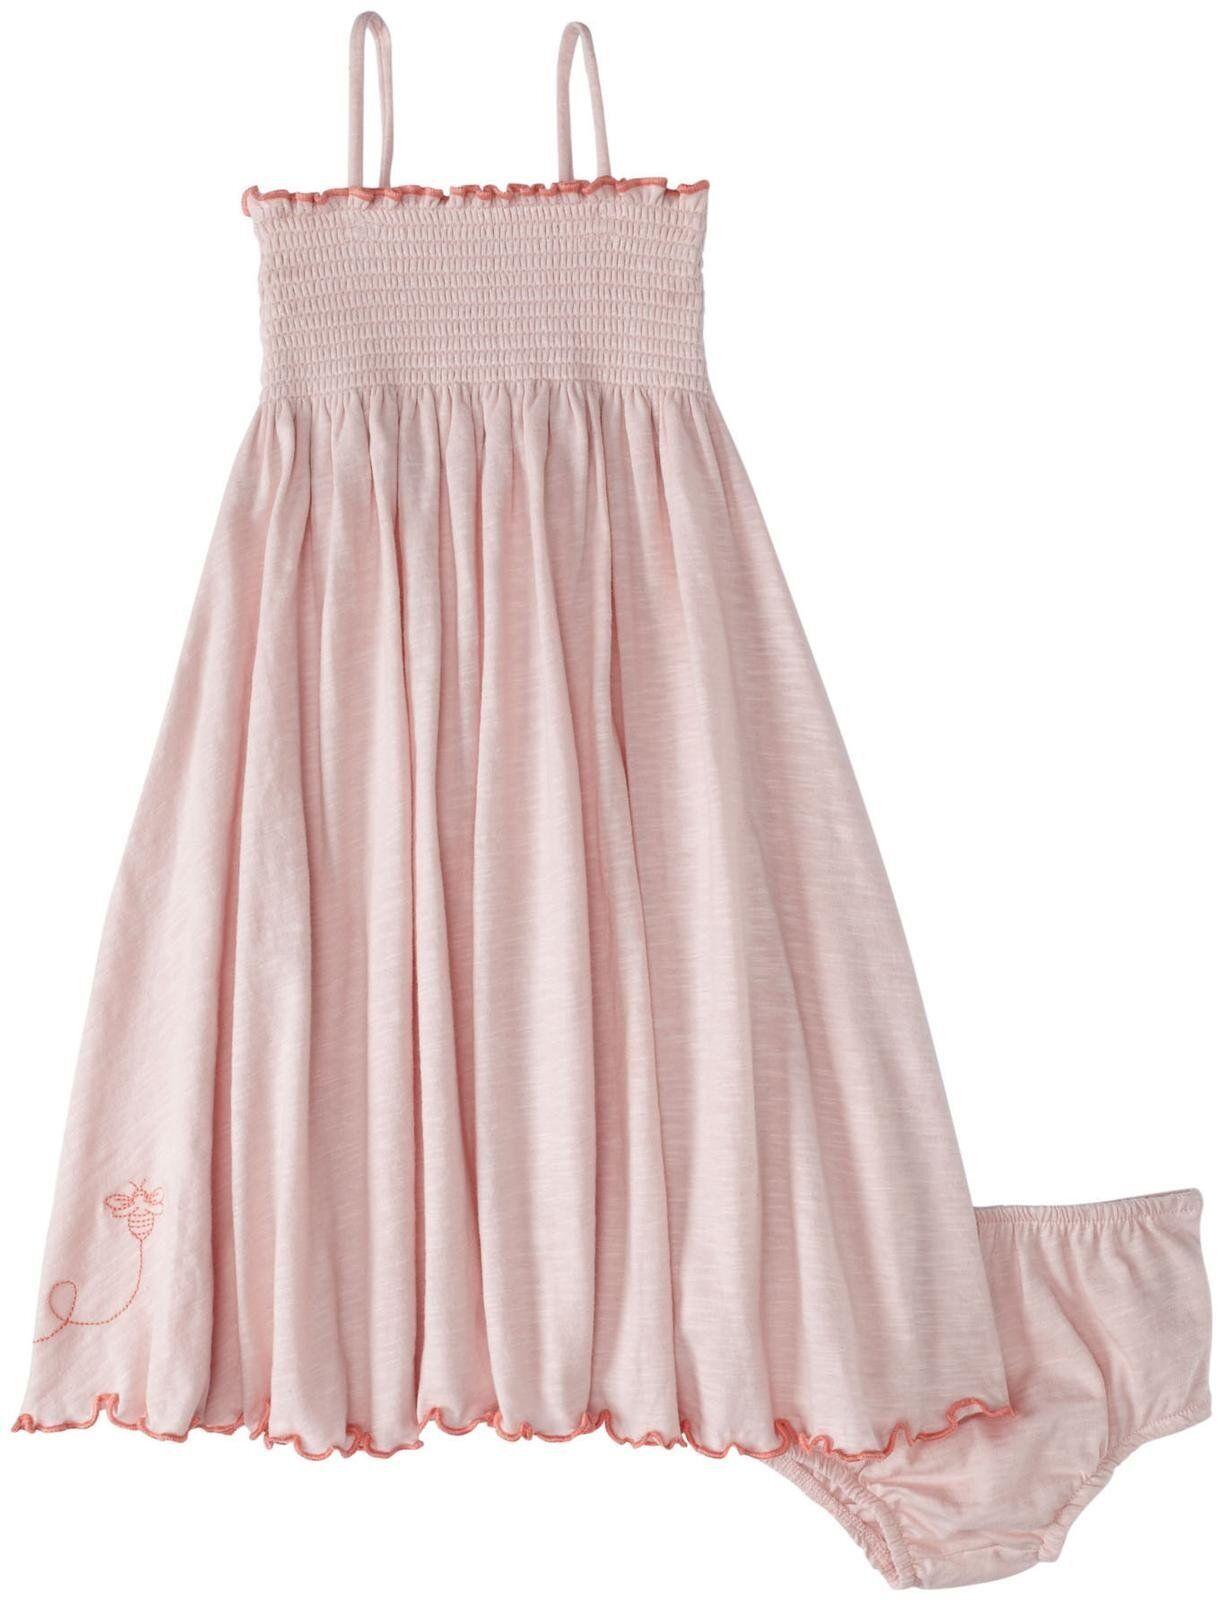 Burt s Bees Baby Girl Knit Dress & Bloomer Set Petal Pink Spaghetti